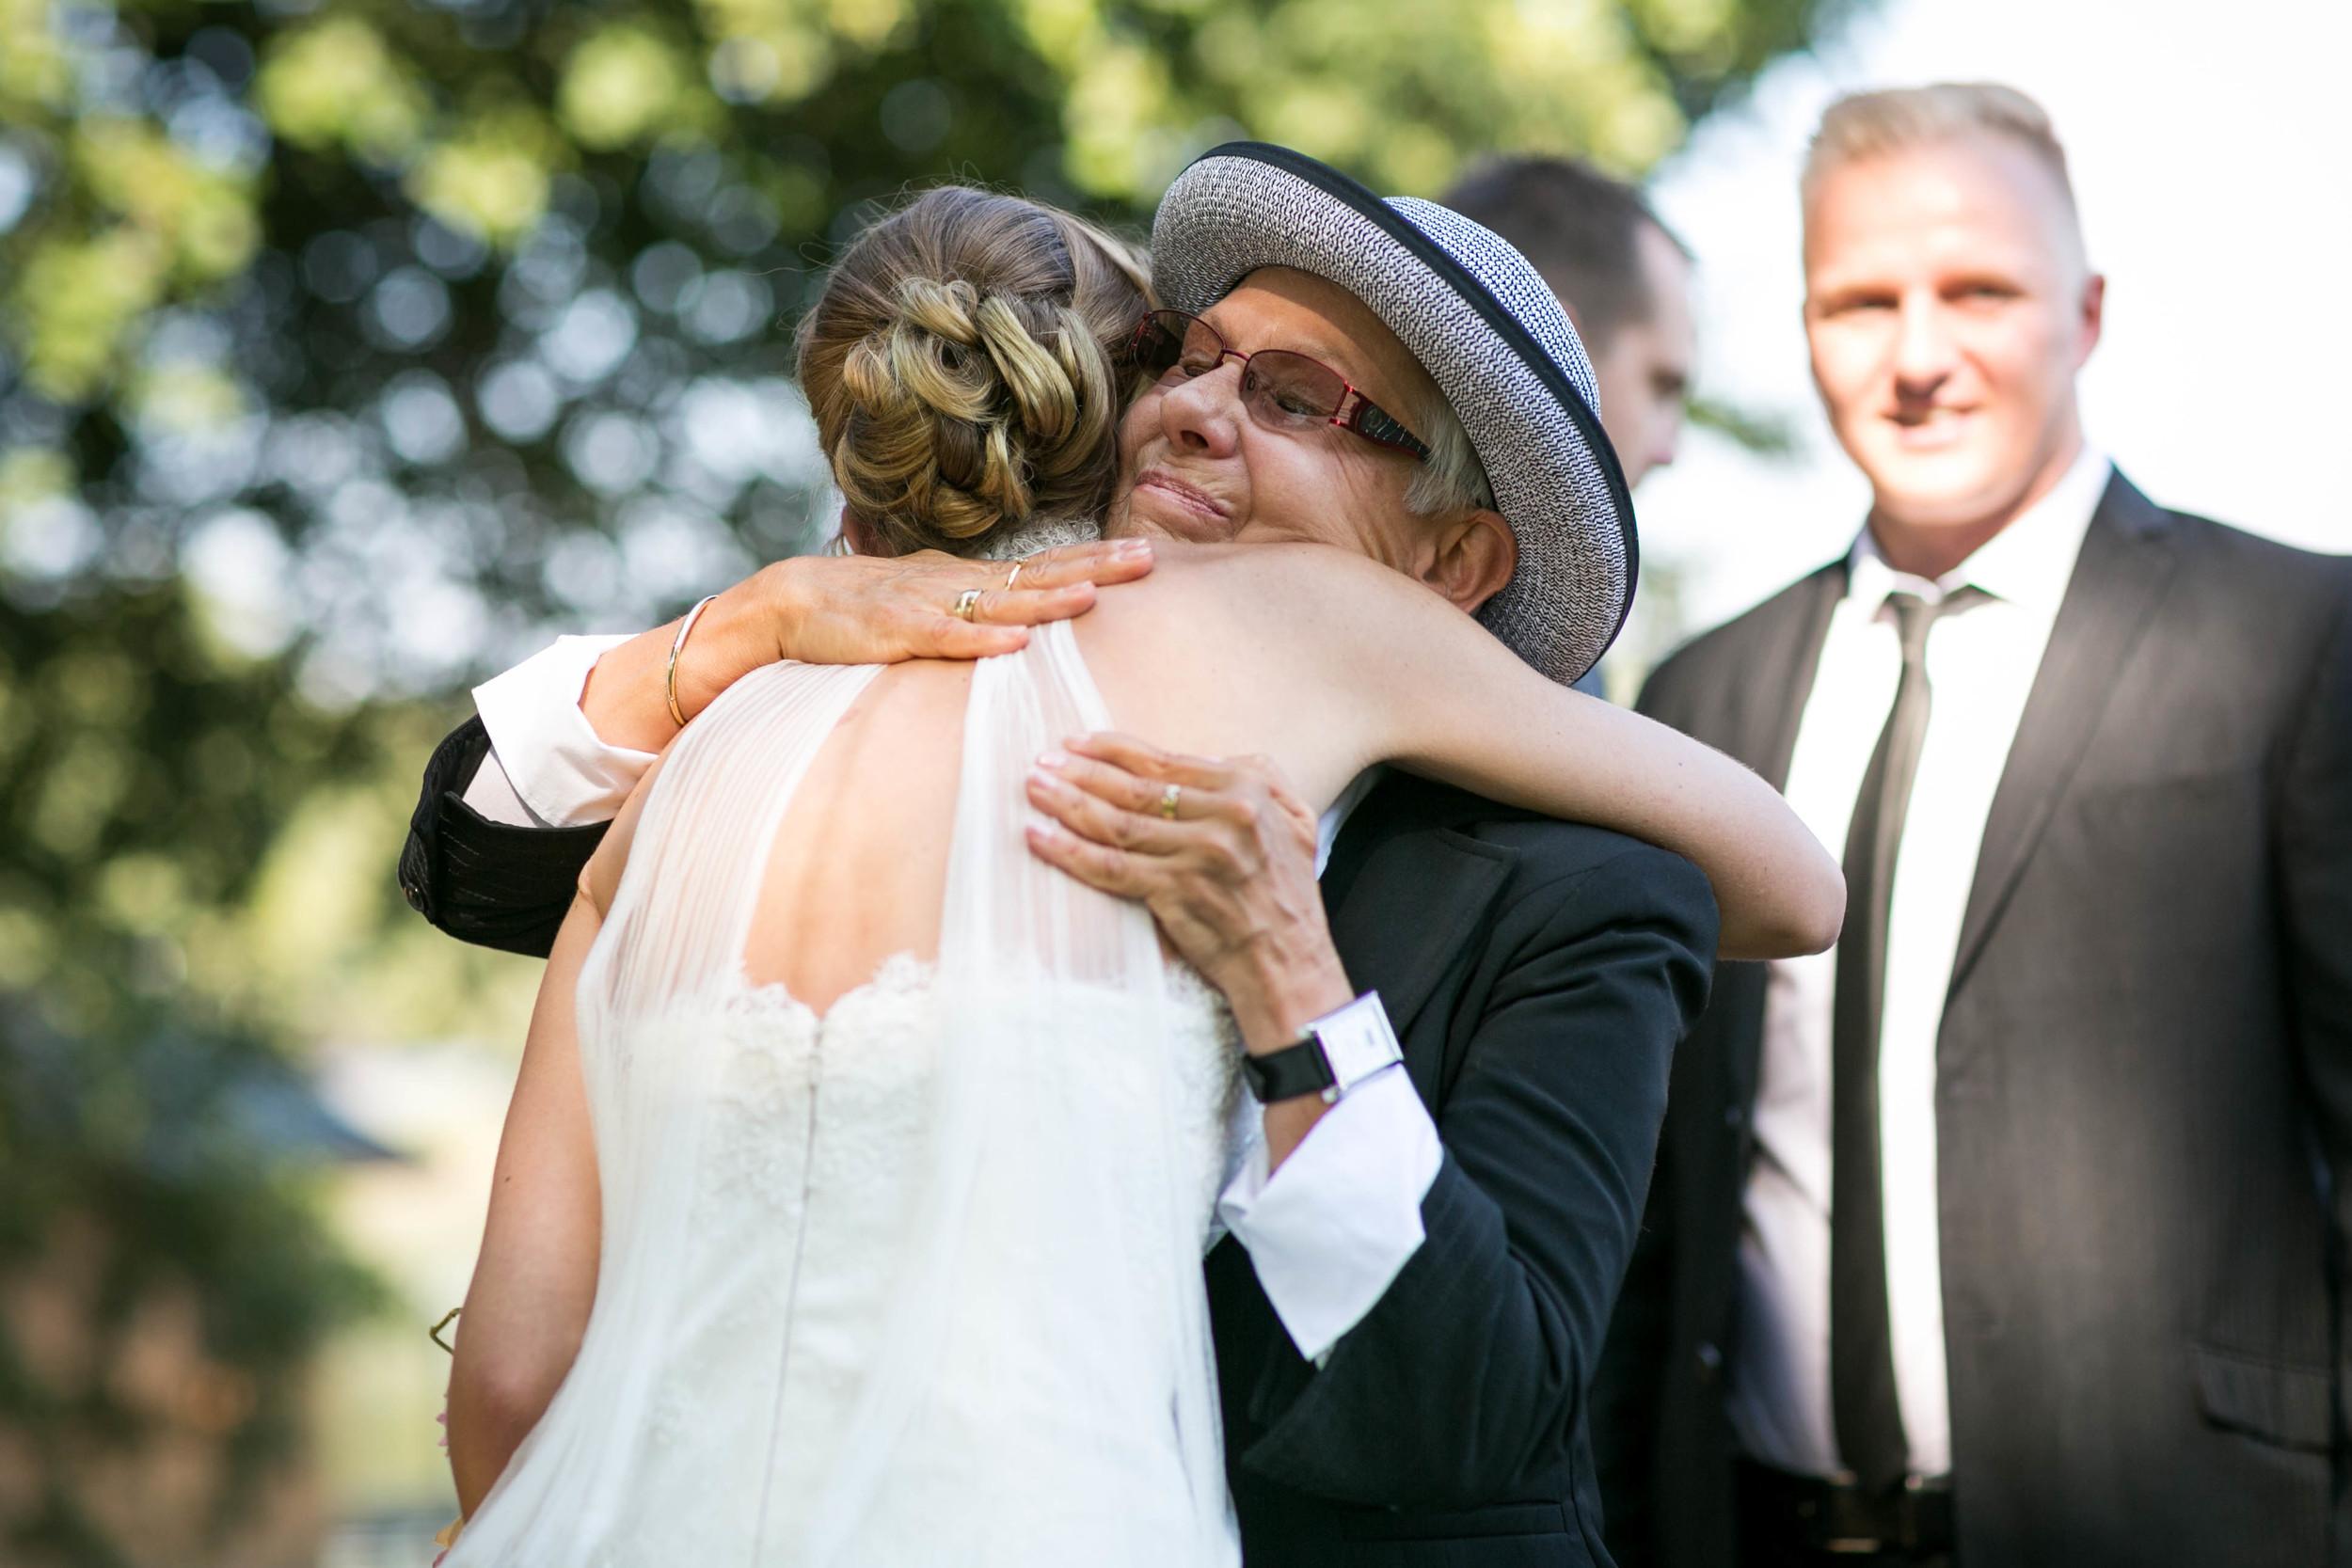 Fran Burrows Hochzeitsfotografie_Kulturgut Wrechen Hochzeit-22.jpg